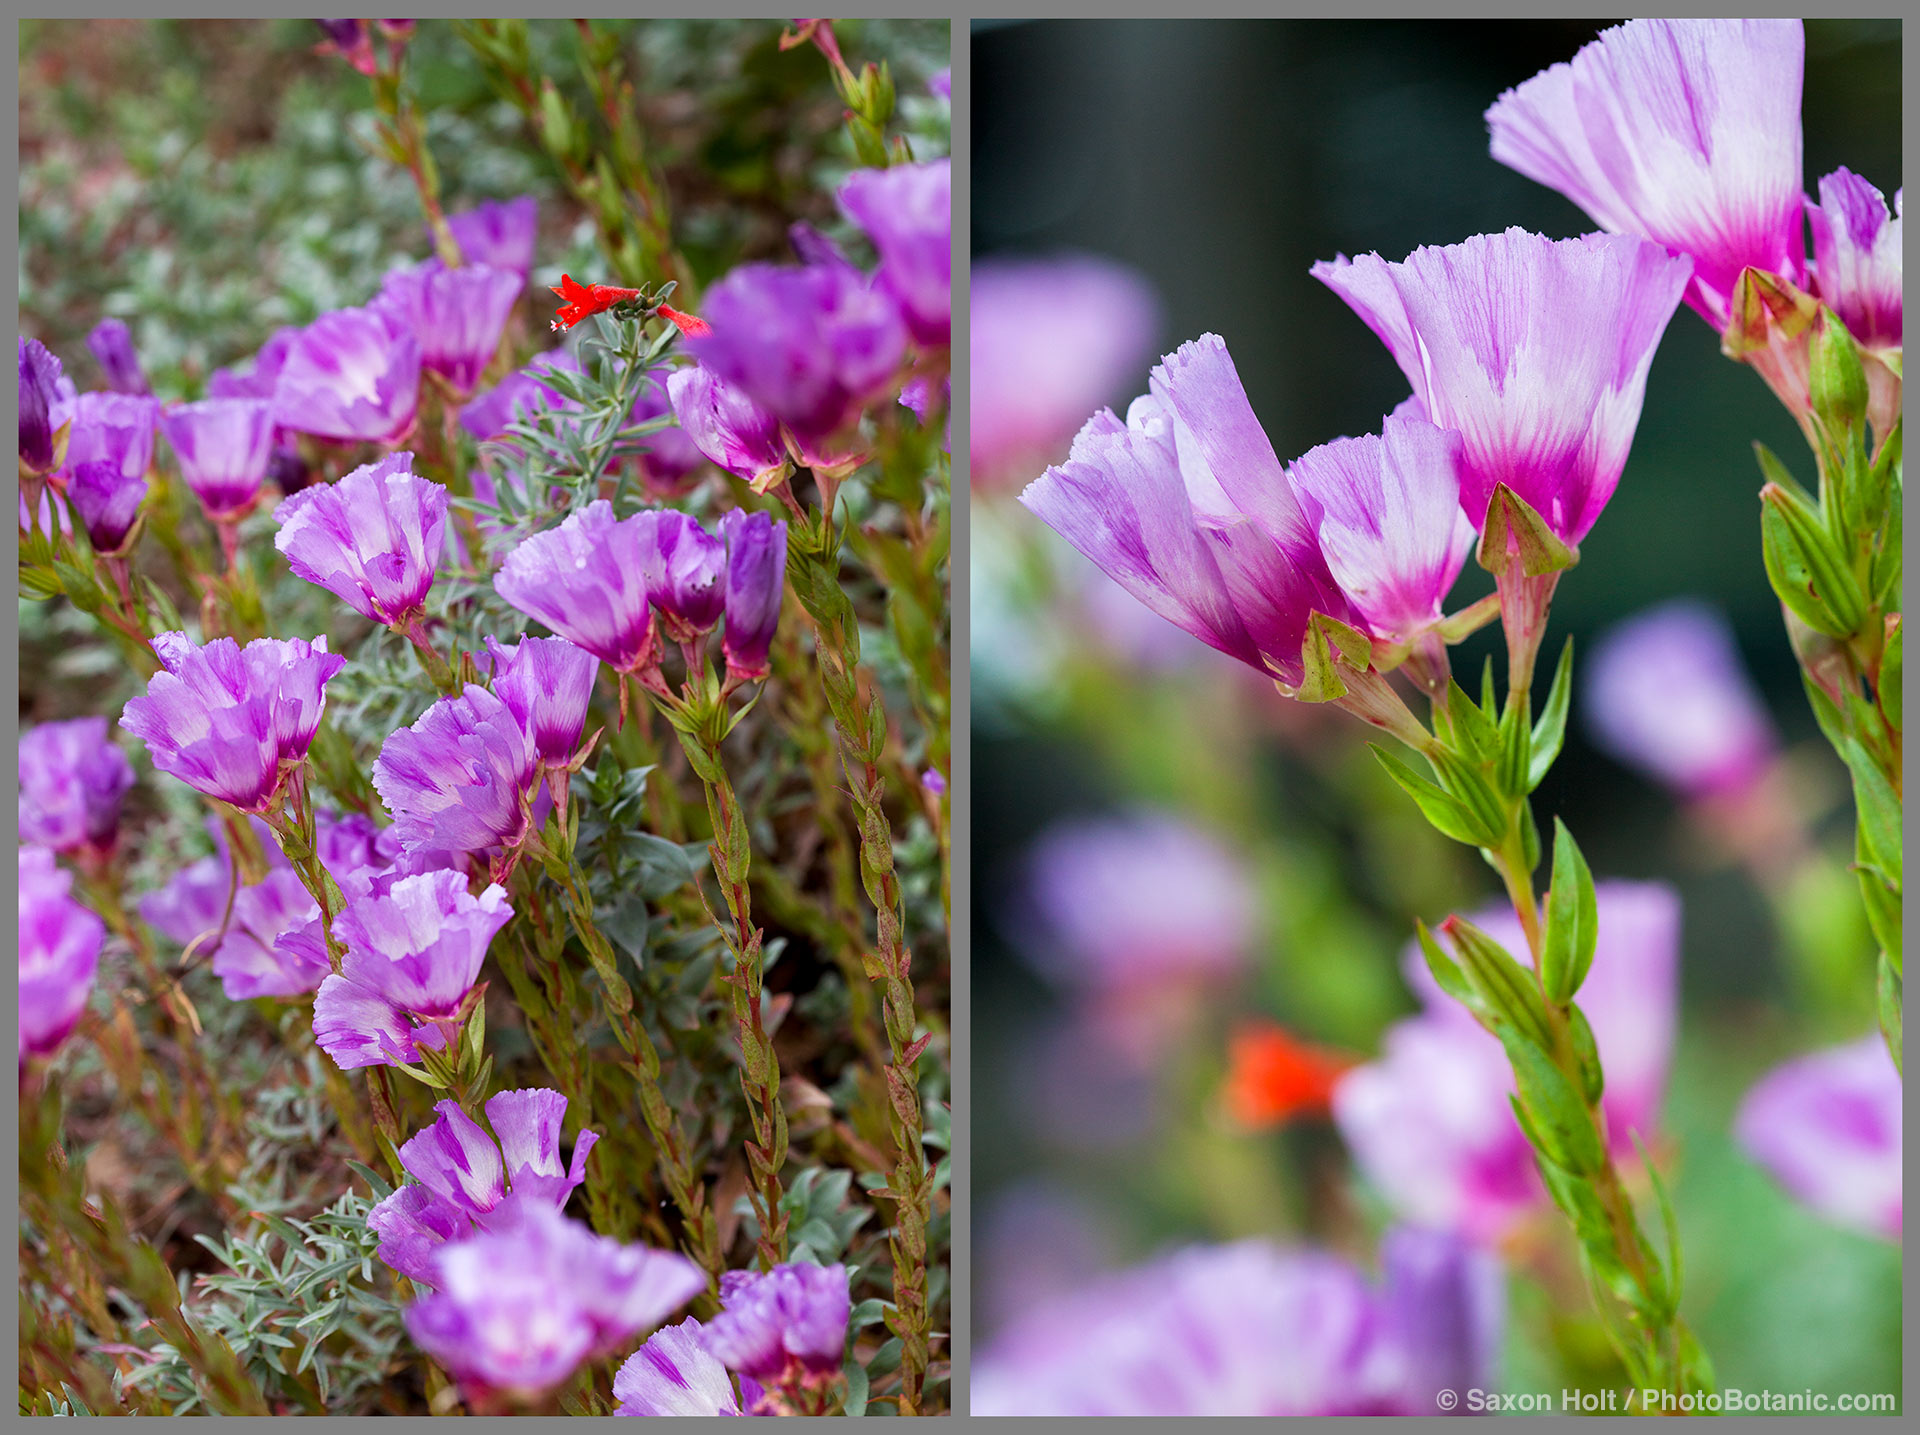 Clarkia williamsonii - Foothill Clarkia flowering annual wildflower, California native plant